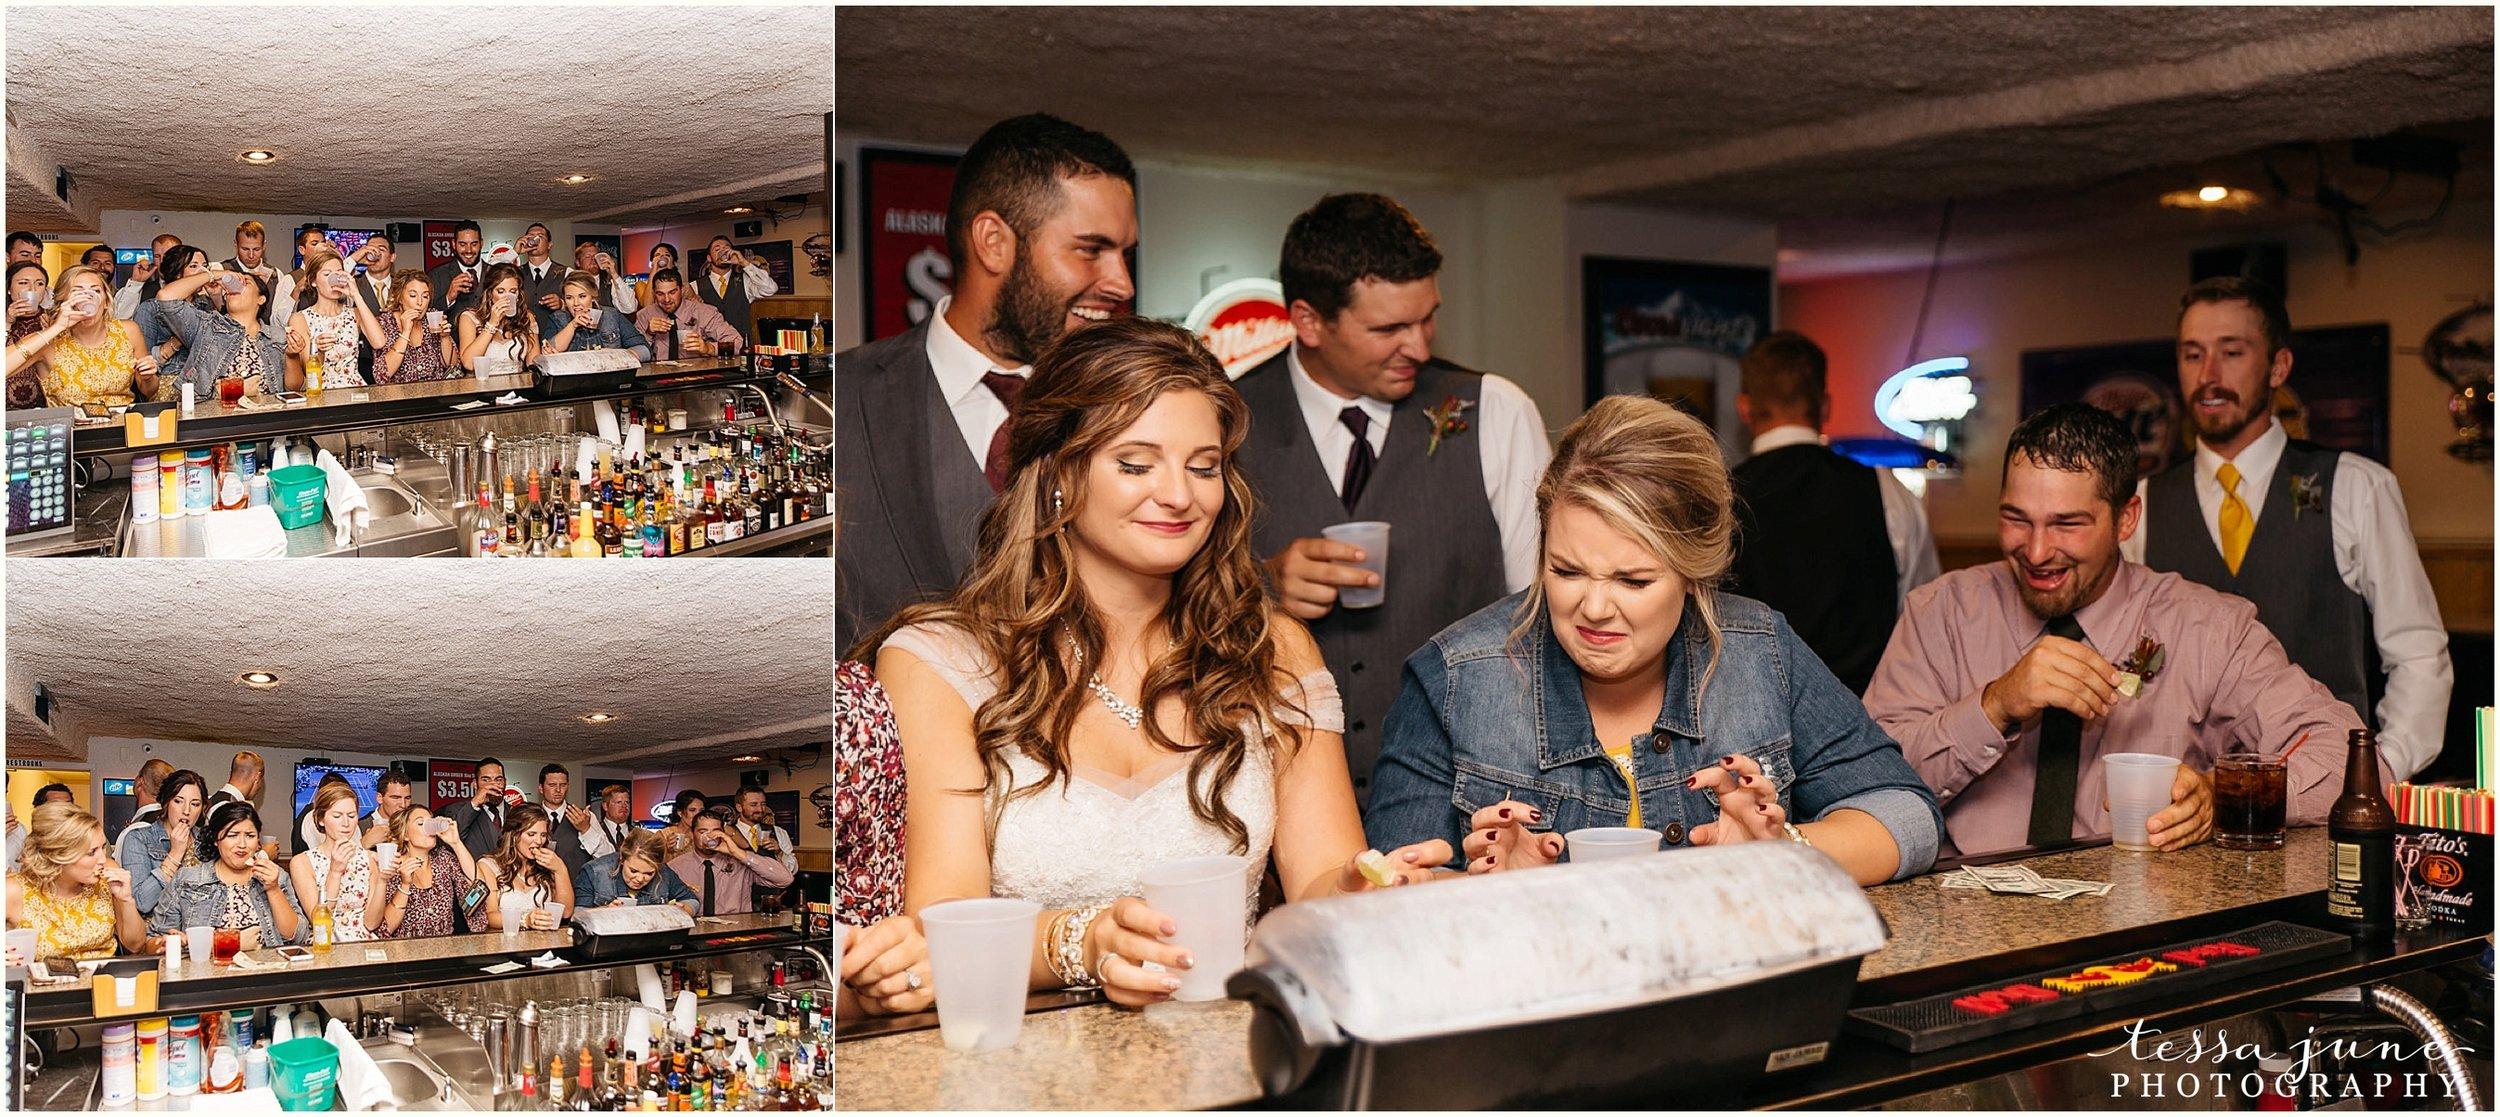 bohemian-minnesota-wedding-mismatched-bridesmaid-dresses-waterfall-st-cloud-tessa-june-photography-125.jpg